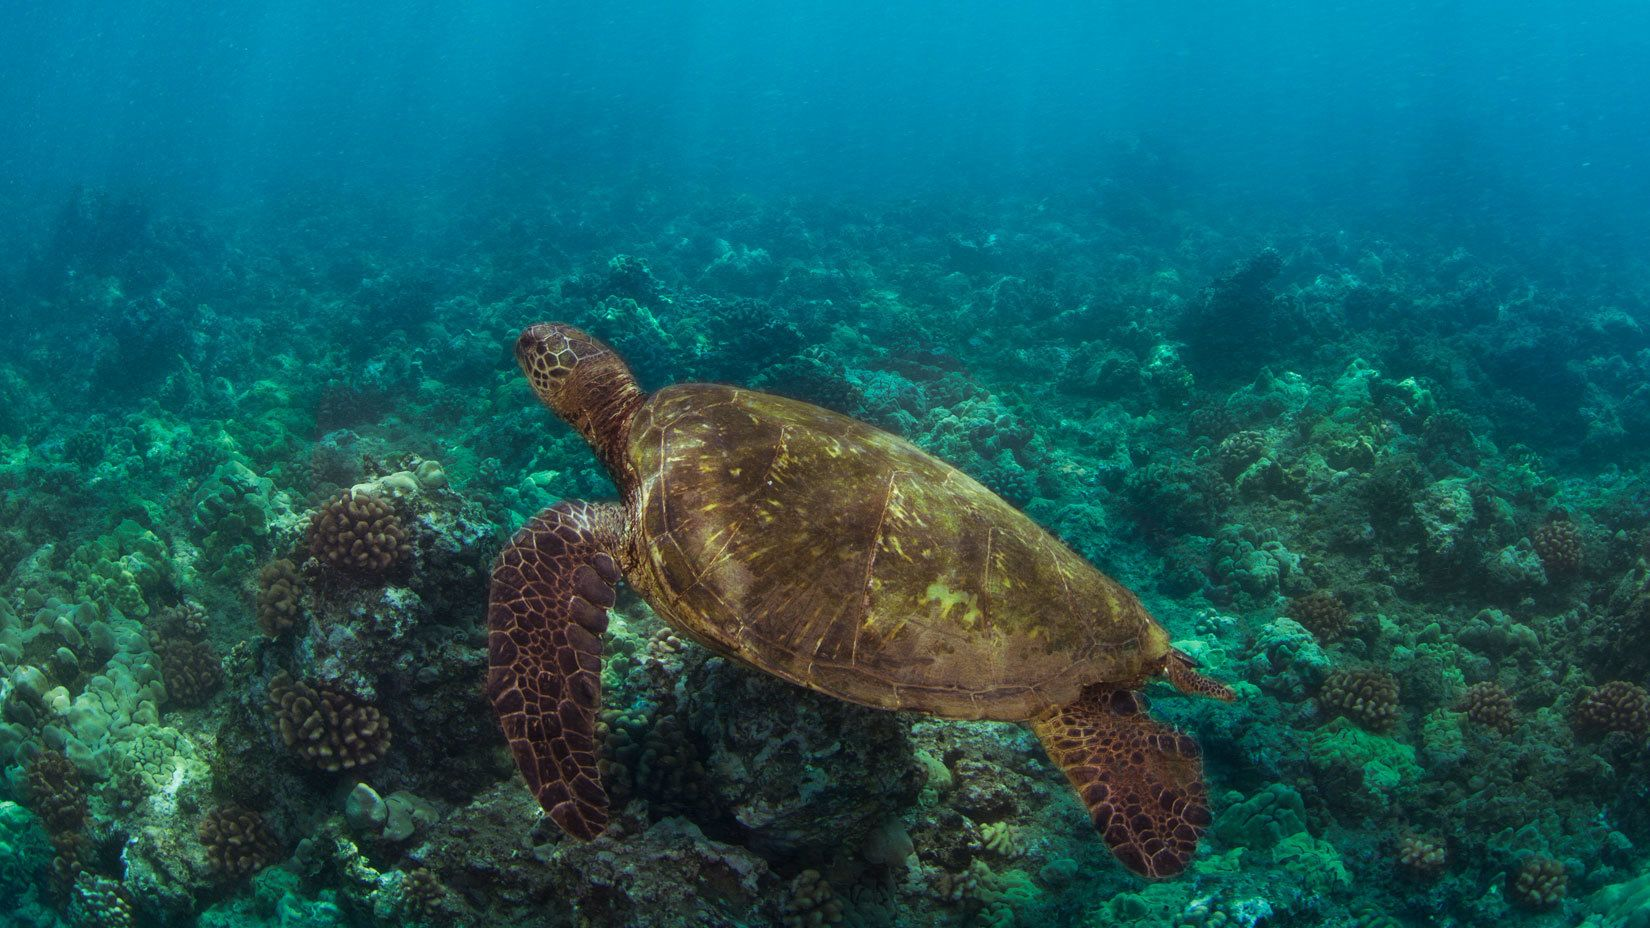 Sea turtle swimming in the ocean near Maui